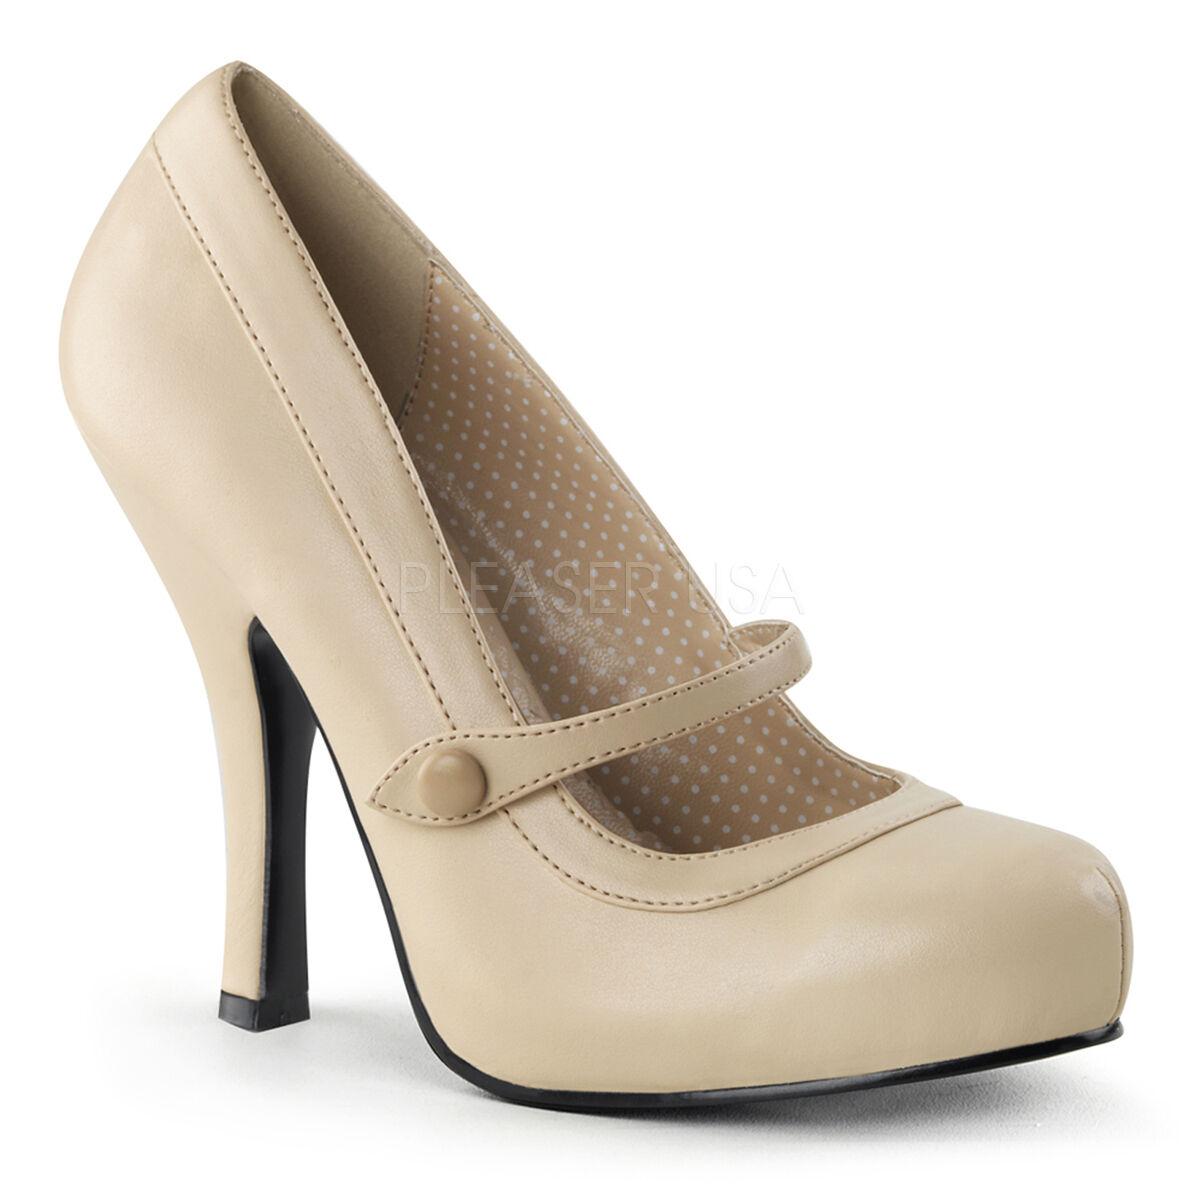 PINUP CUTIE02/CRPU Sexy Beige Tan Light Cream Mary Jane Pumps High Heels